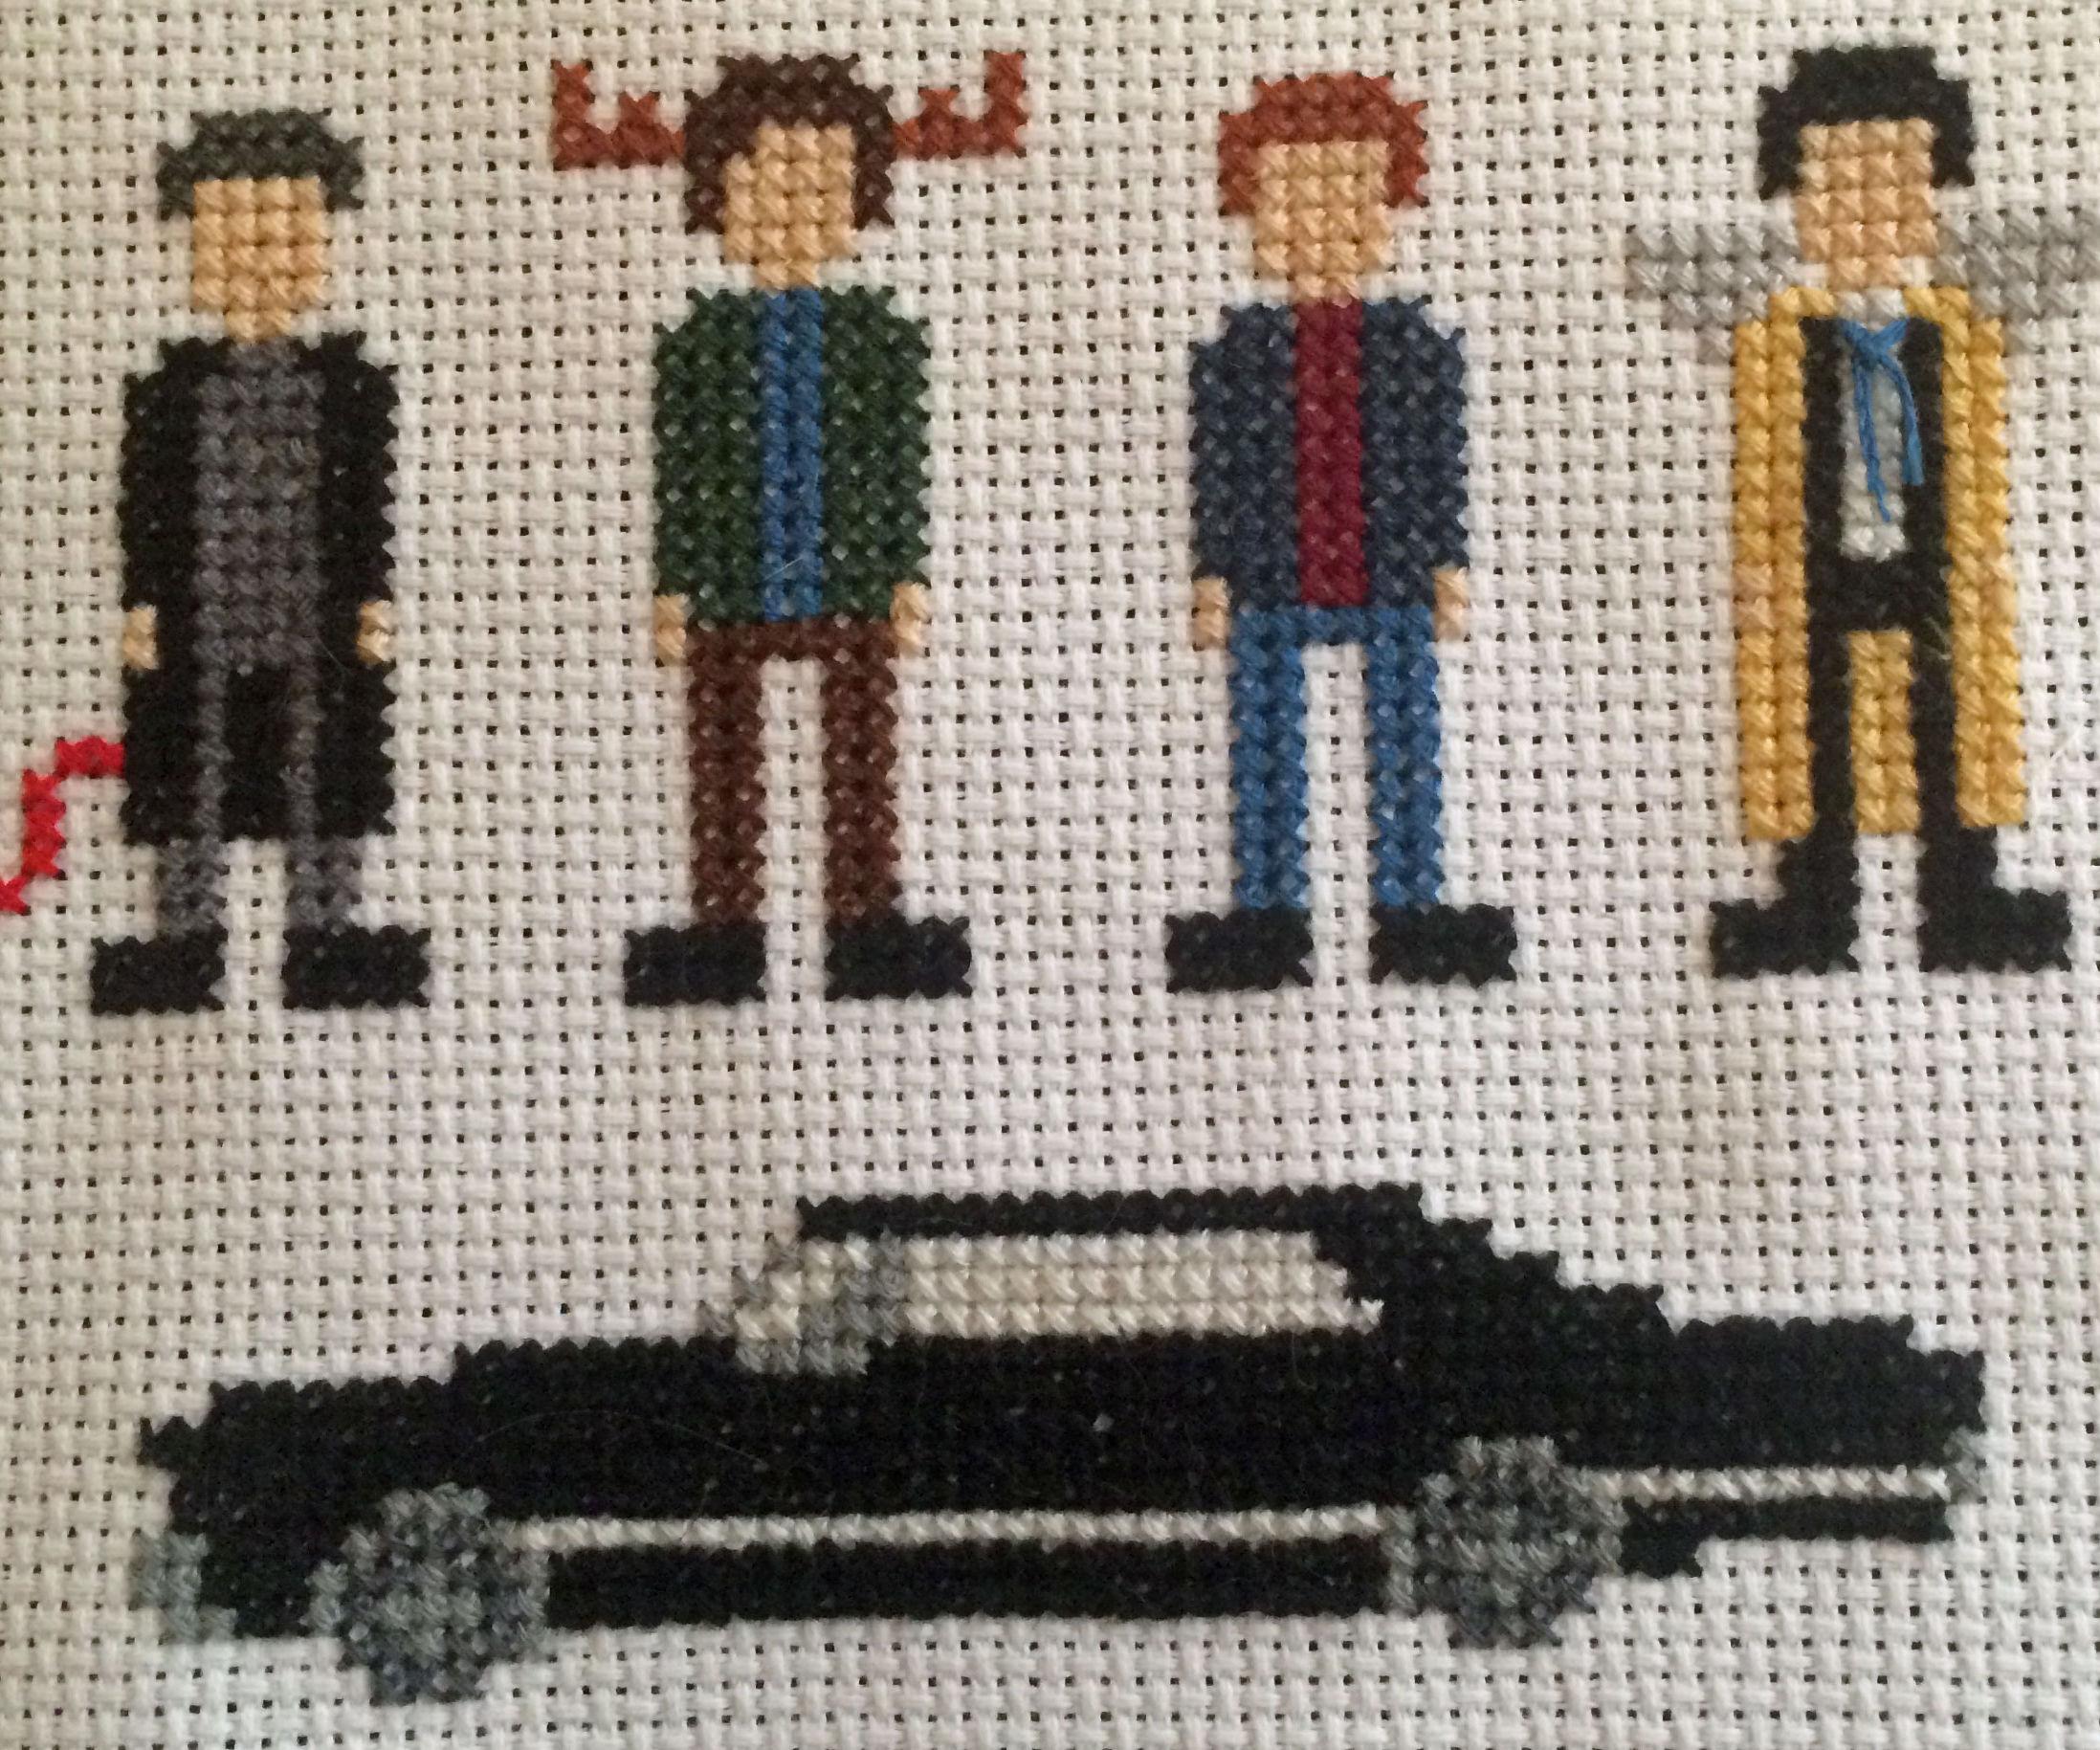 Supernatural Cross Stitch: Team Free Will (+ Crowley)